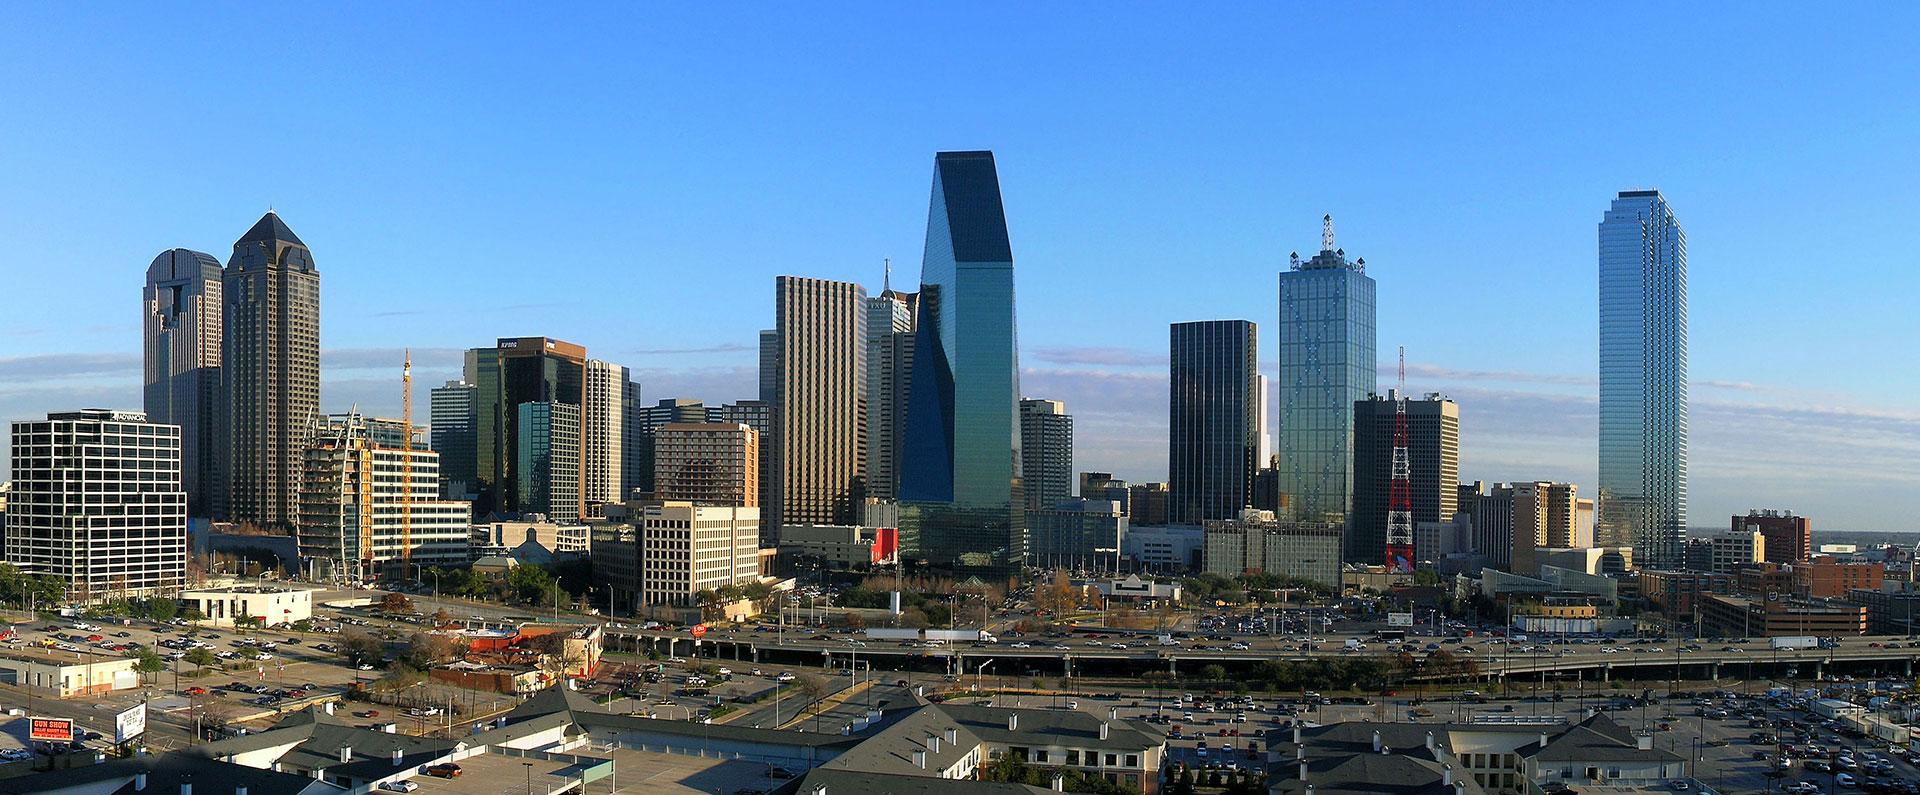 Dallas_Texas_Skyline_20062